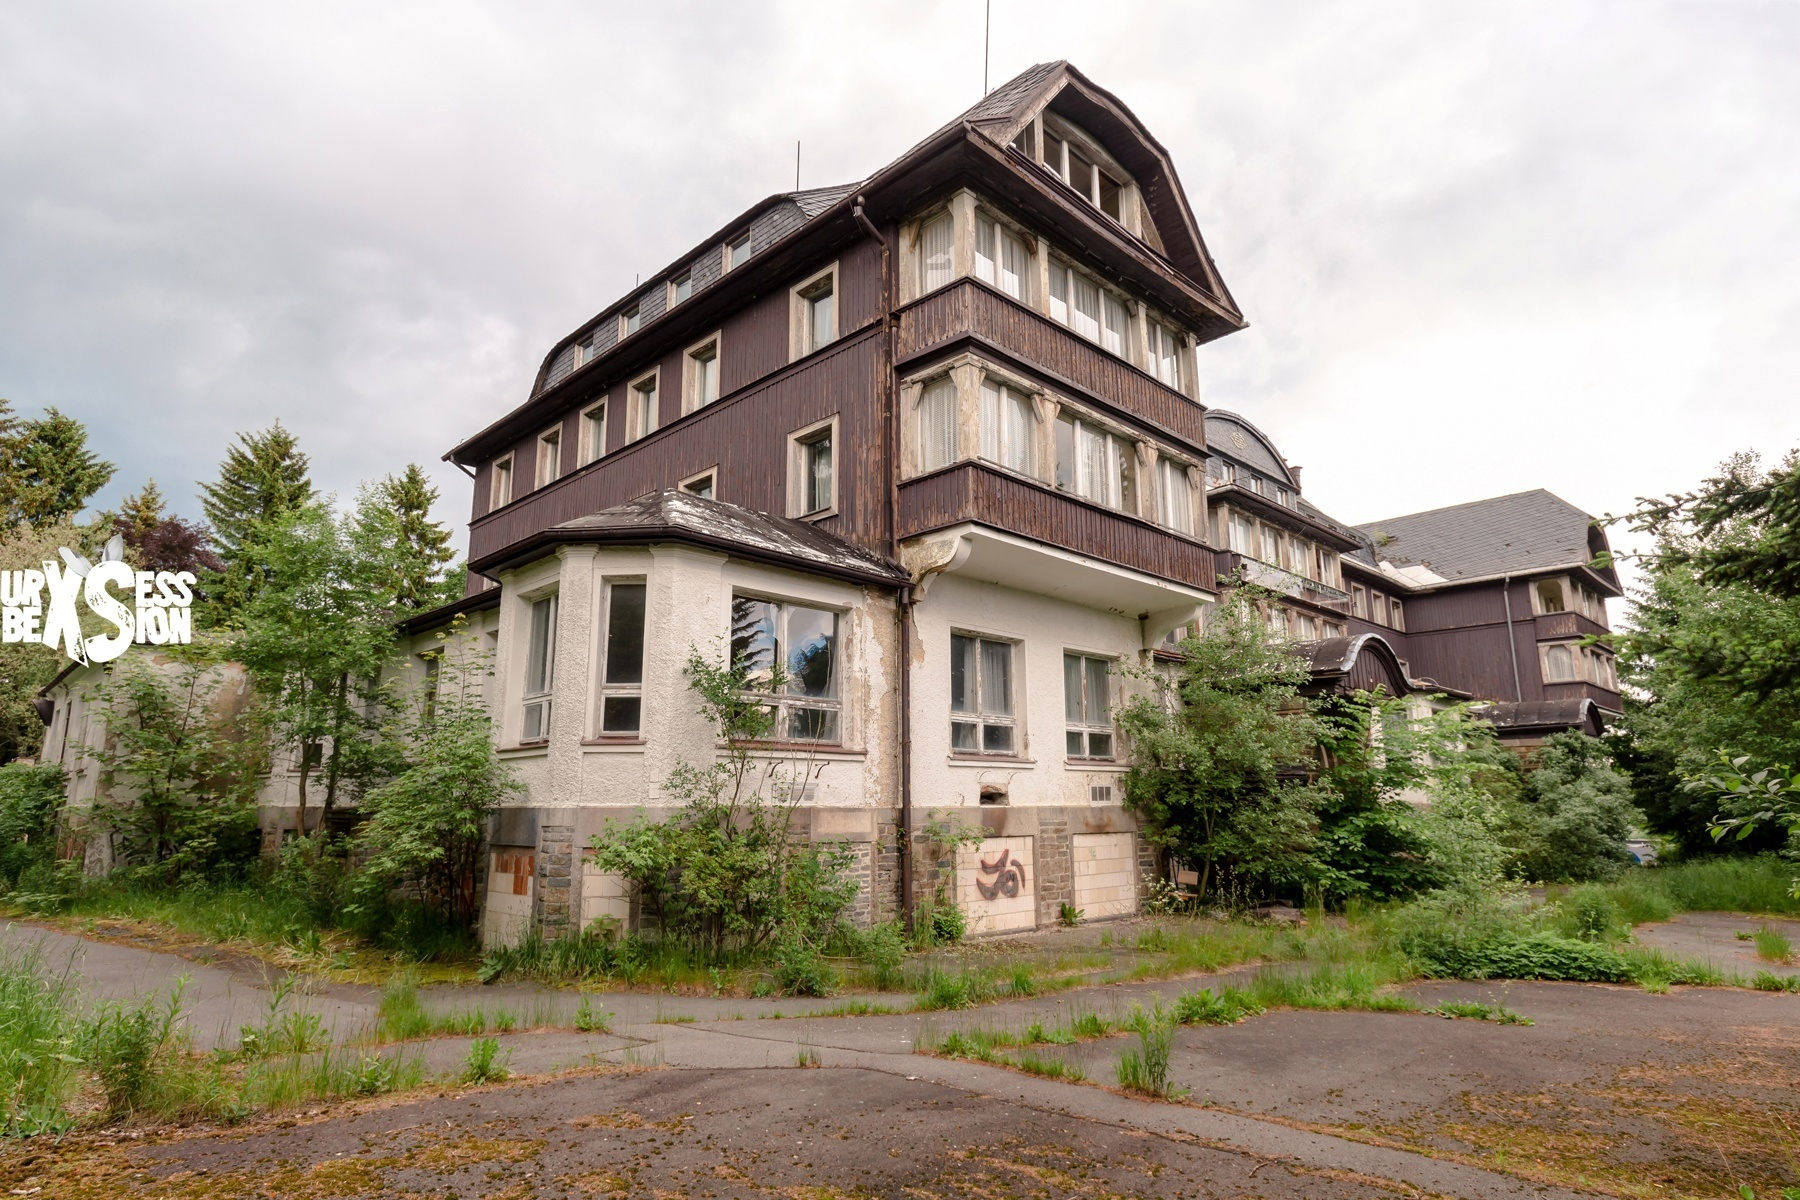 Abandoned hotel in Germany | urbexsession.com/en/oleg-naumov-hotel | Urbex Germany